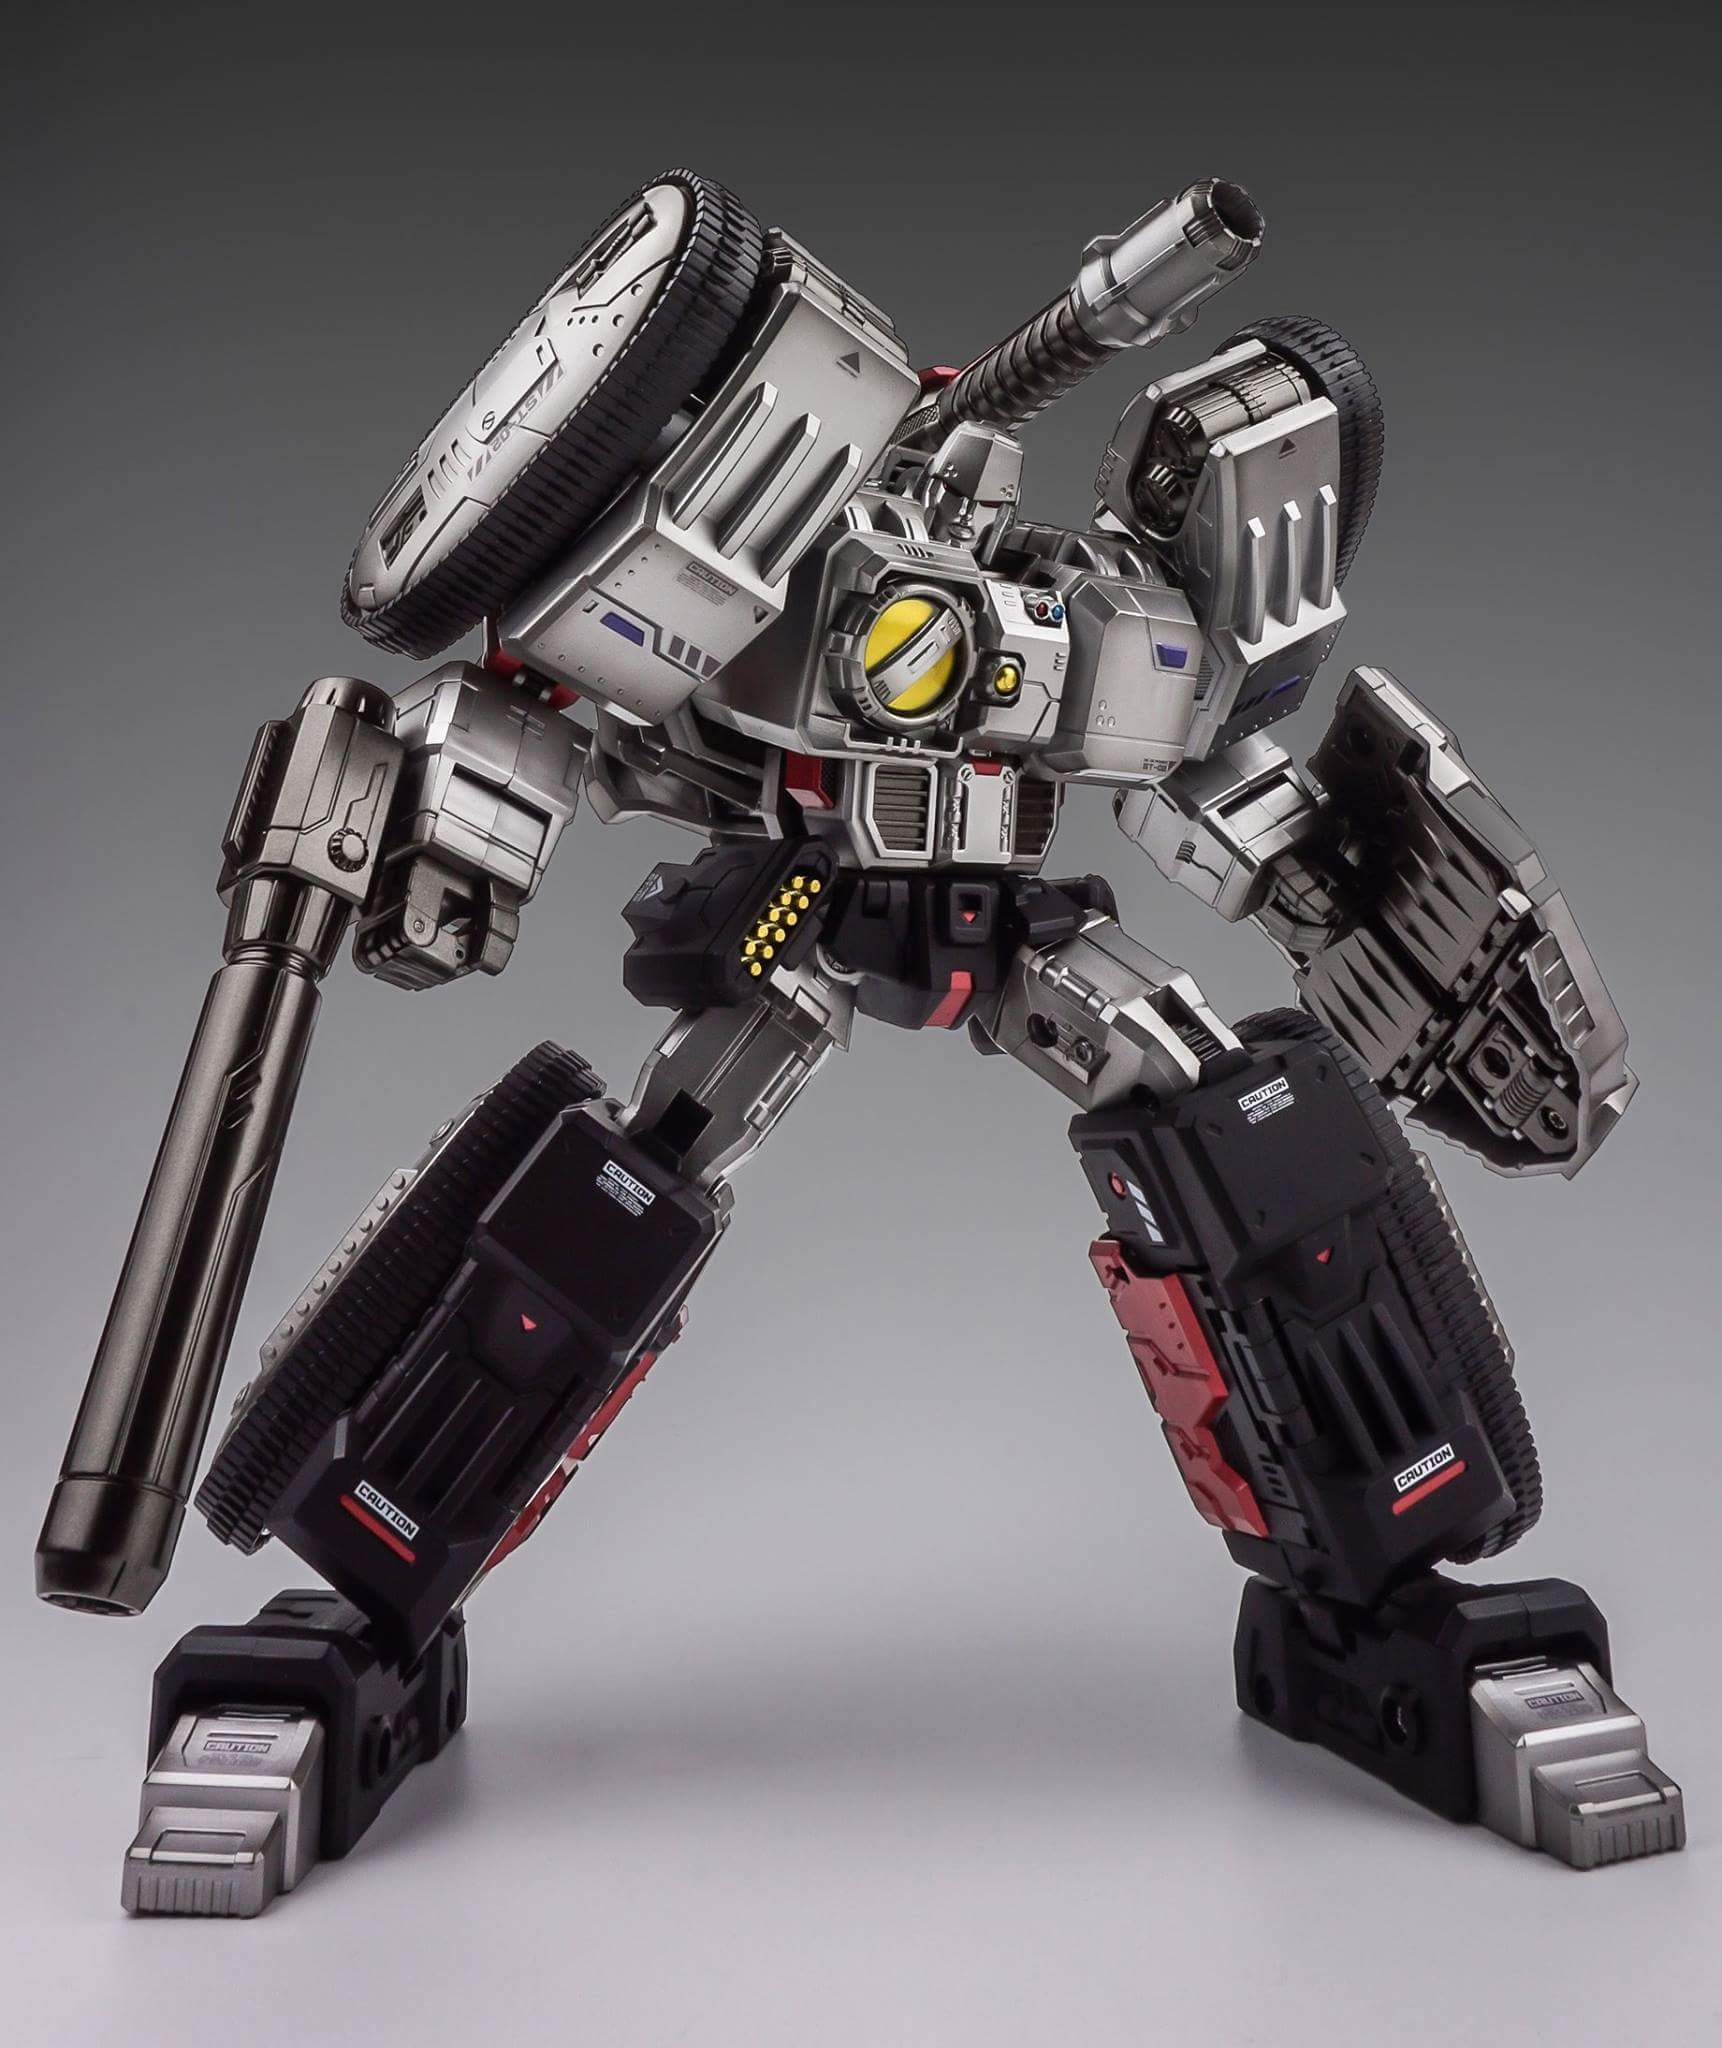 [SparkToys] Produit Tiers - ST - aka War Within: Optimus, Mégatron, Grimlock/La Menace, etc - Page 2 IzWKEdqS